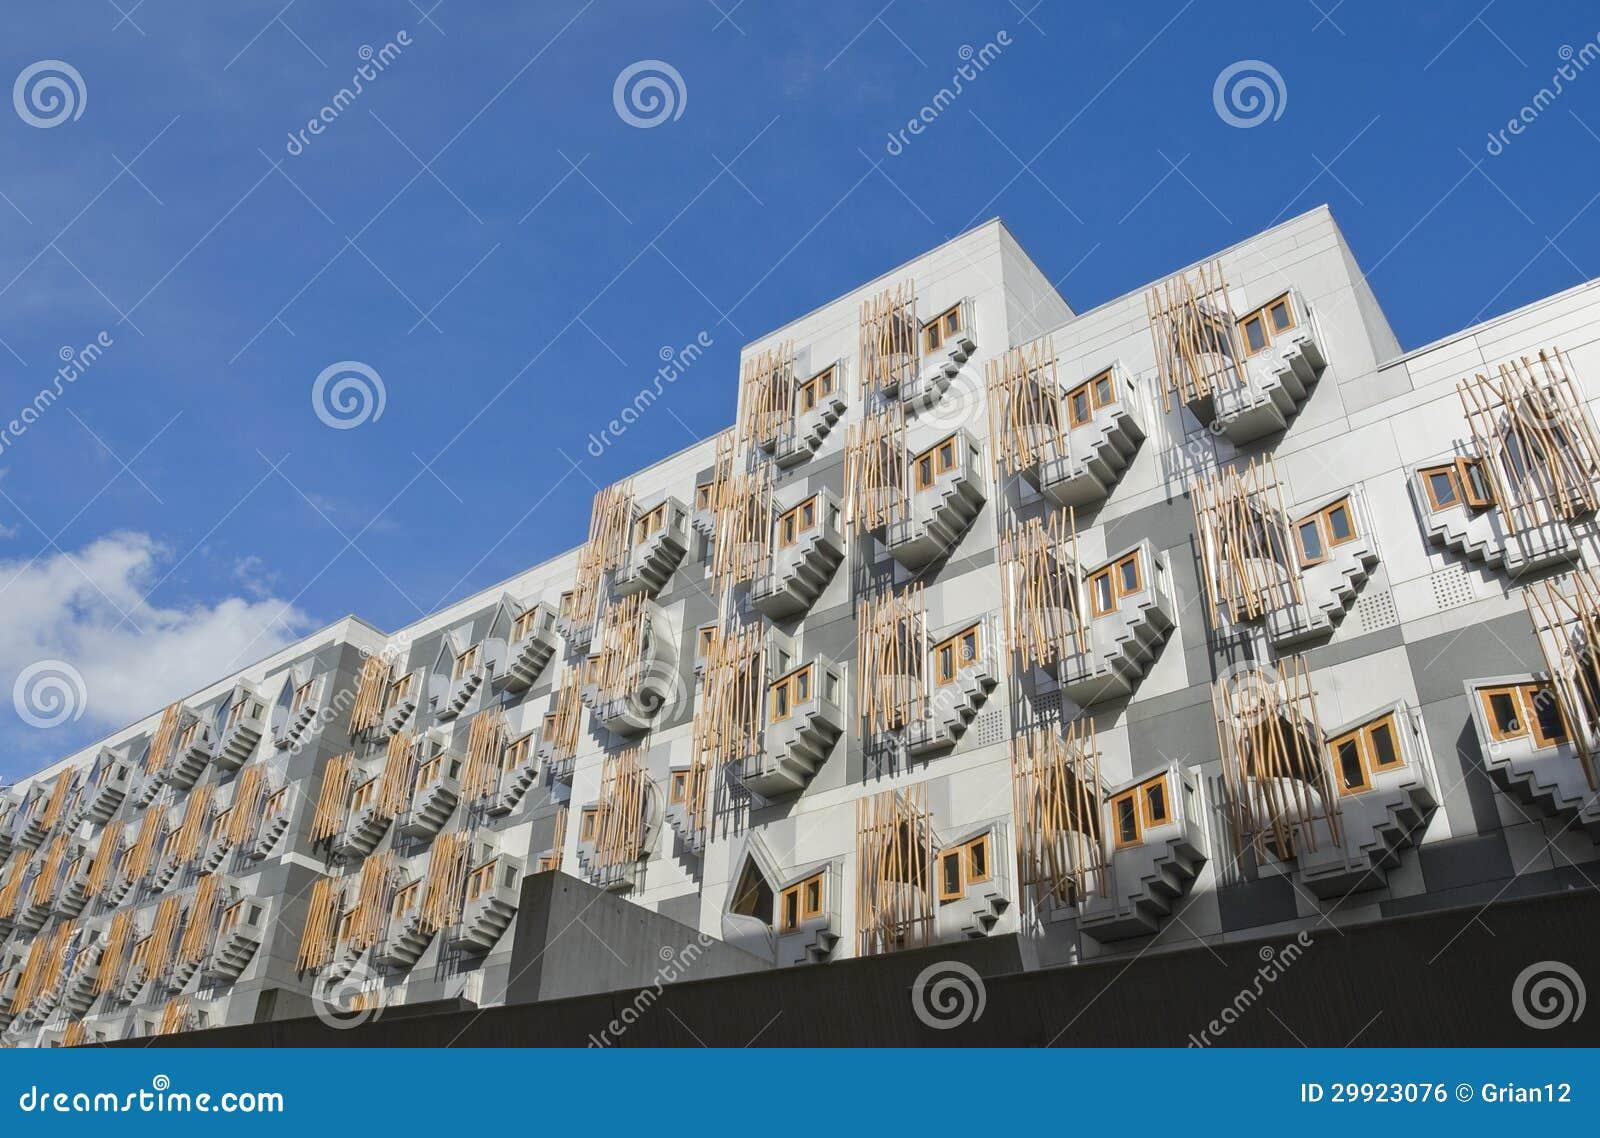 Architettura moderna edimburgo fotografia stock for Disegno di architettura online